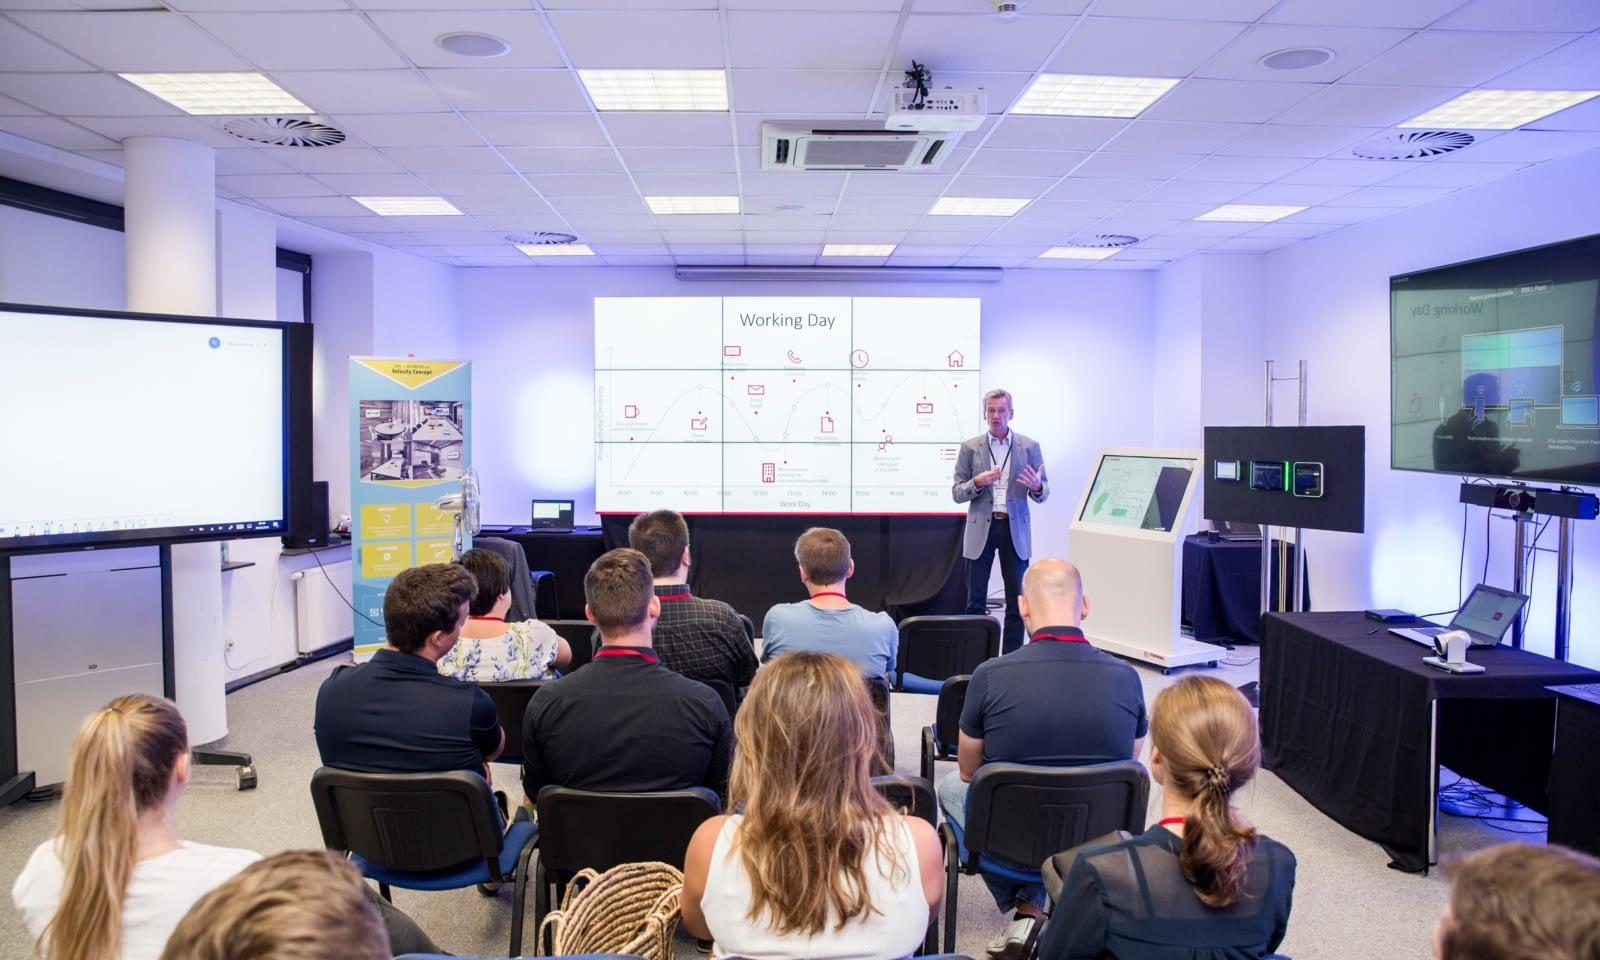 Warsztaty Brill AV Media 2019 Rozwiązania AV dla nowoczesnego biura